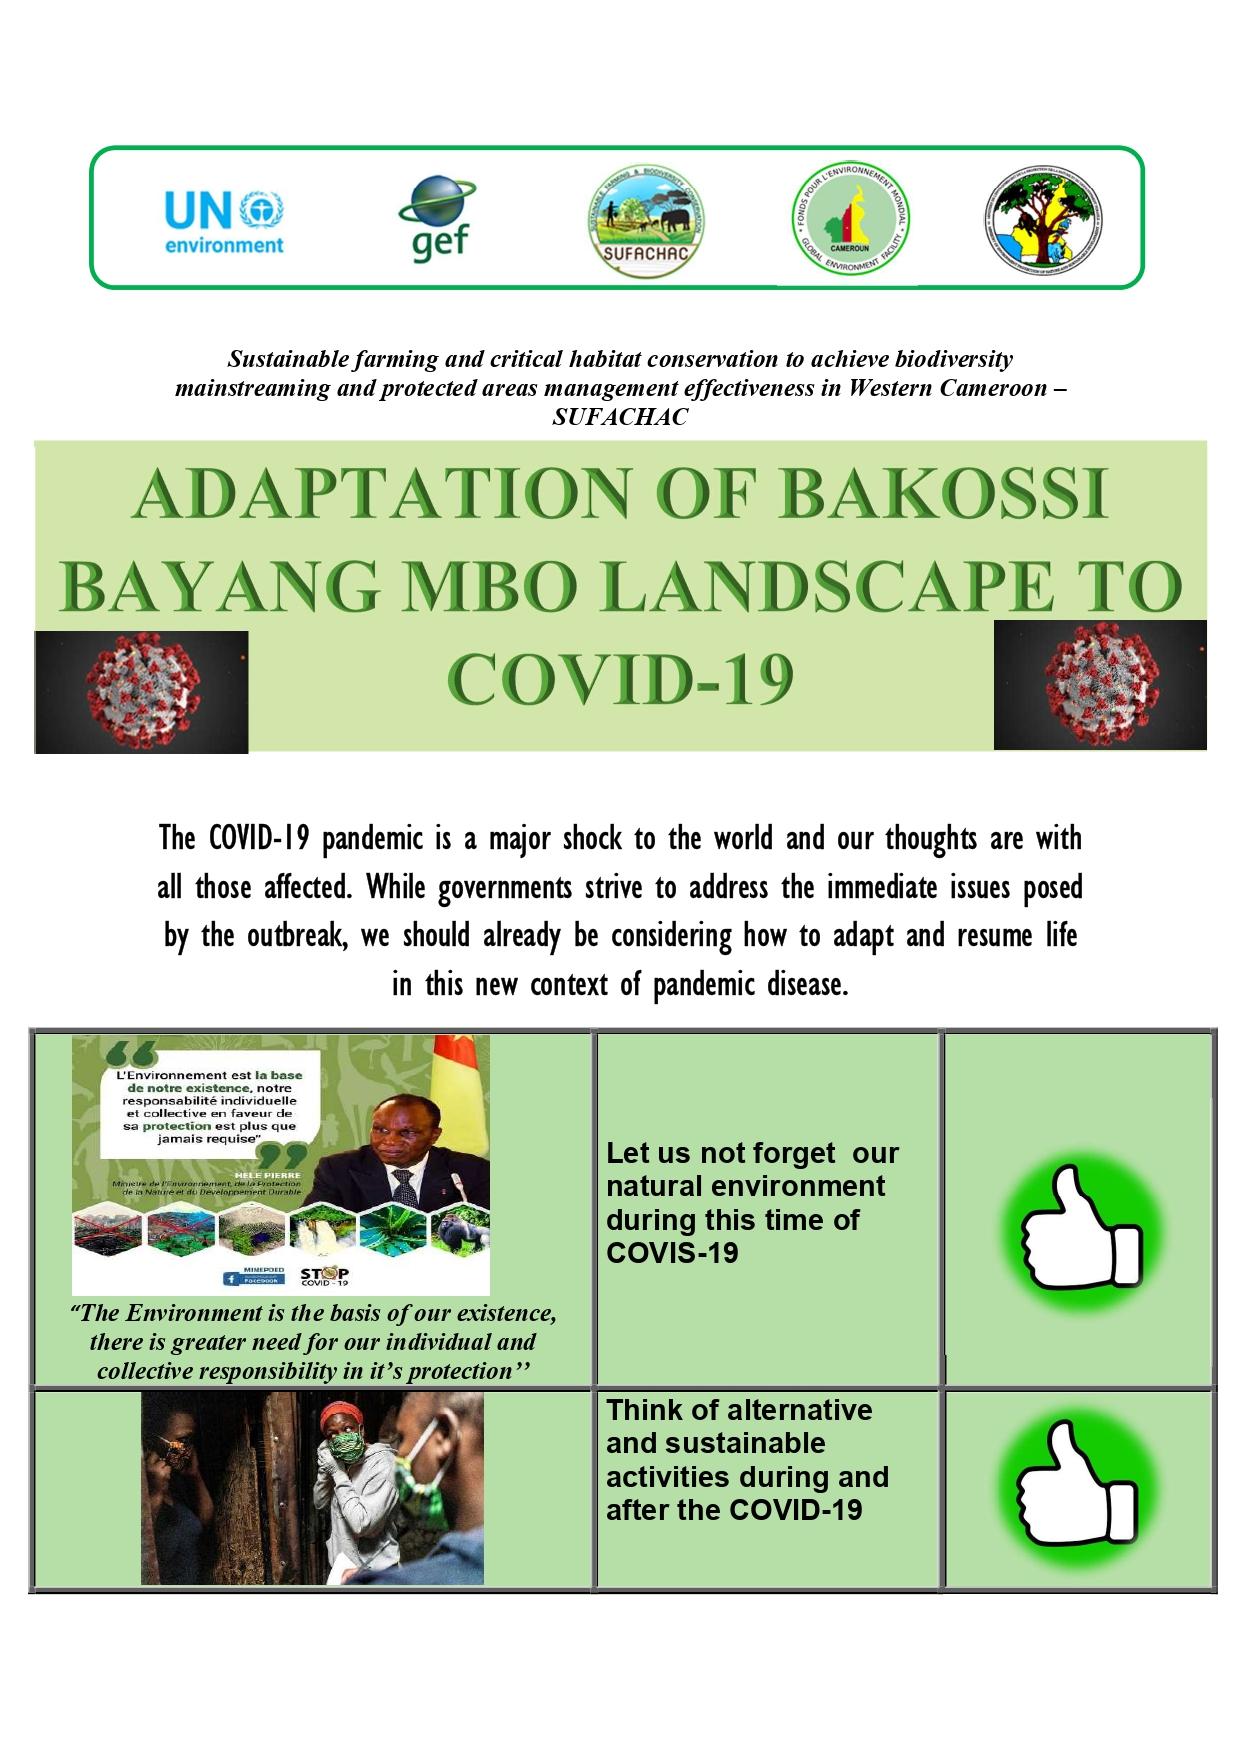 ADAPTATION OF BAKOSSI BAYANG MBO LANDSCAPE TO COVID-19